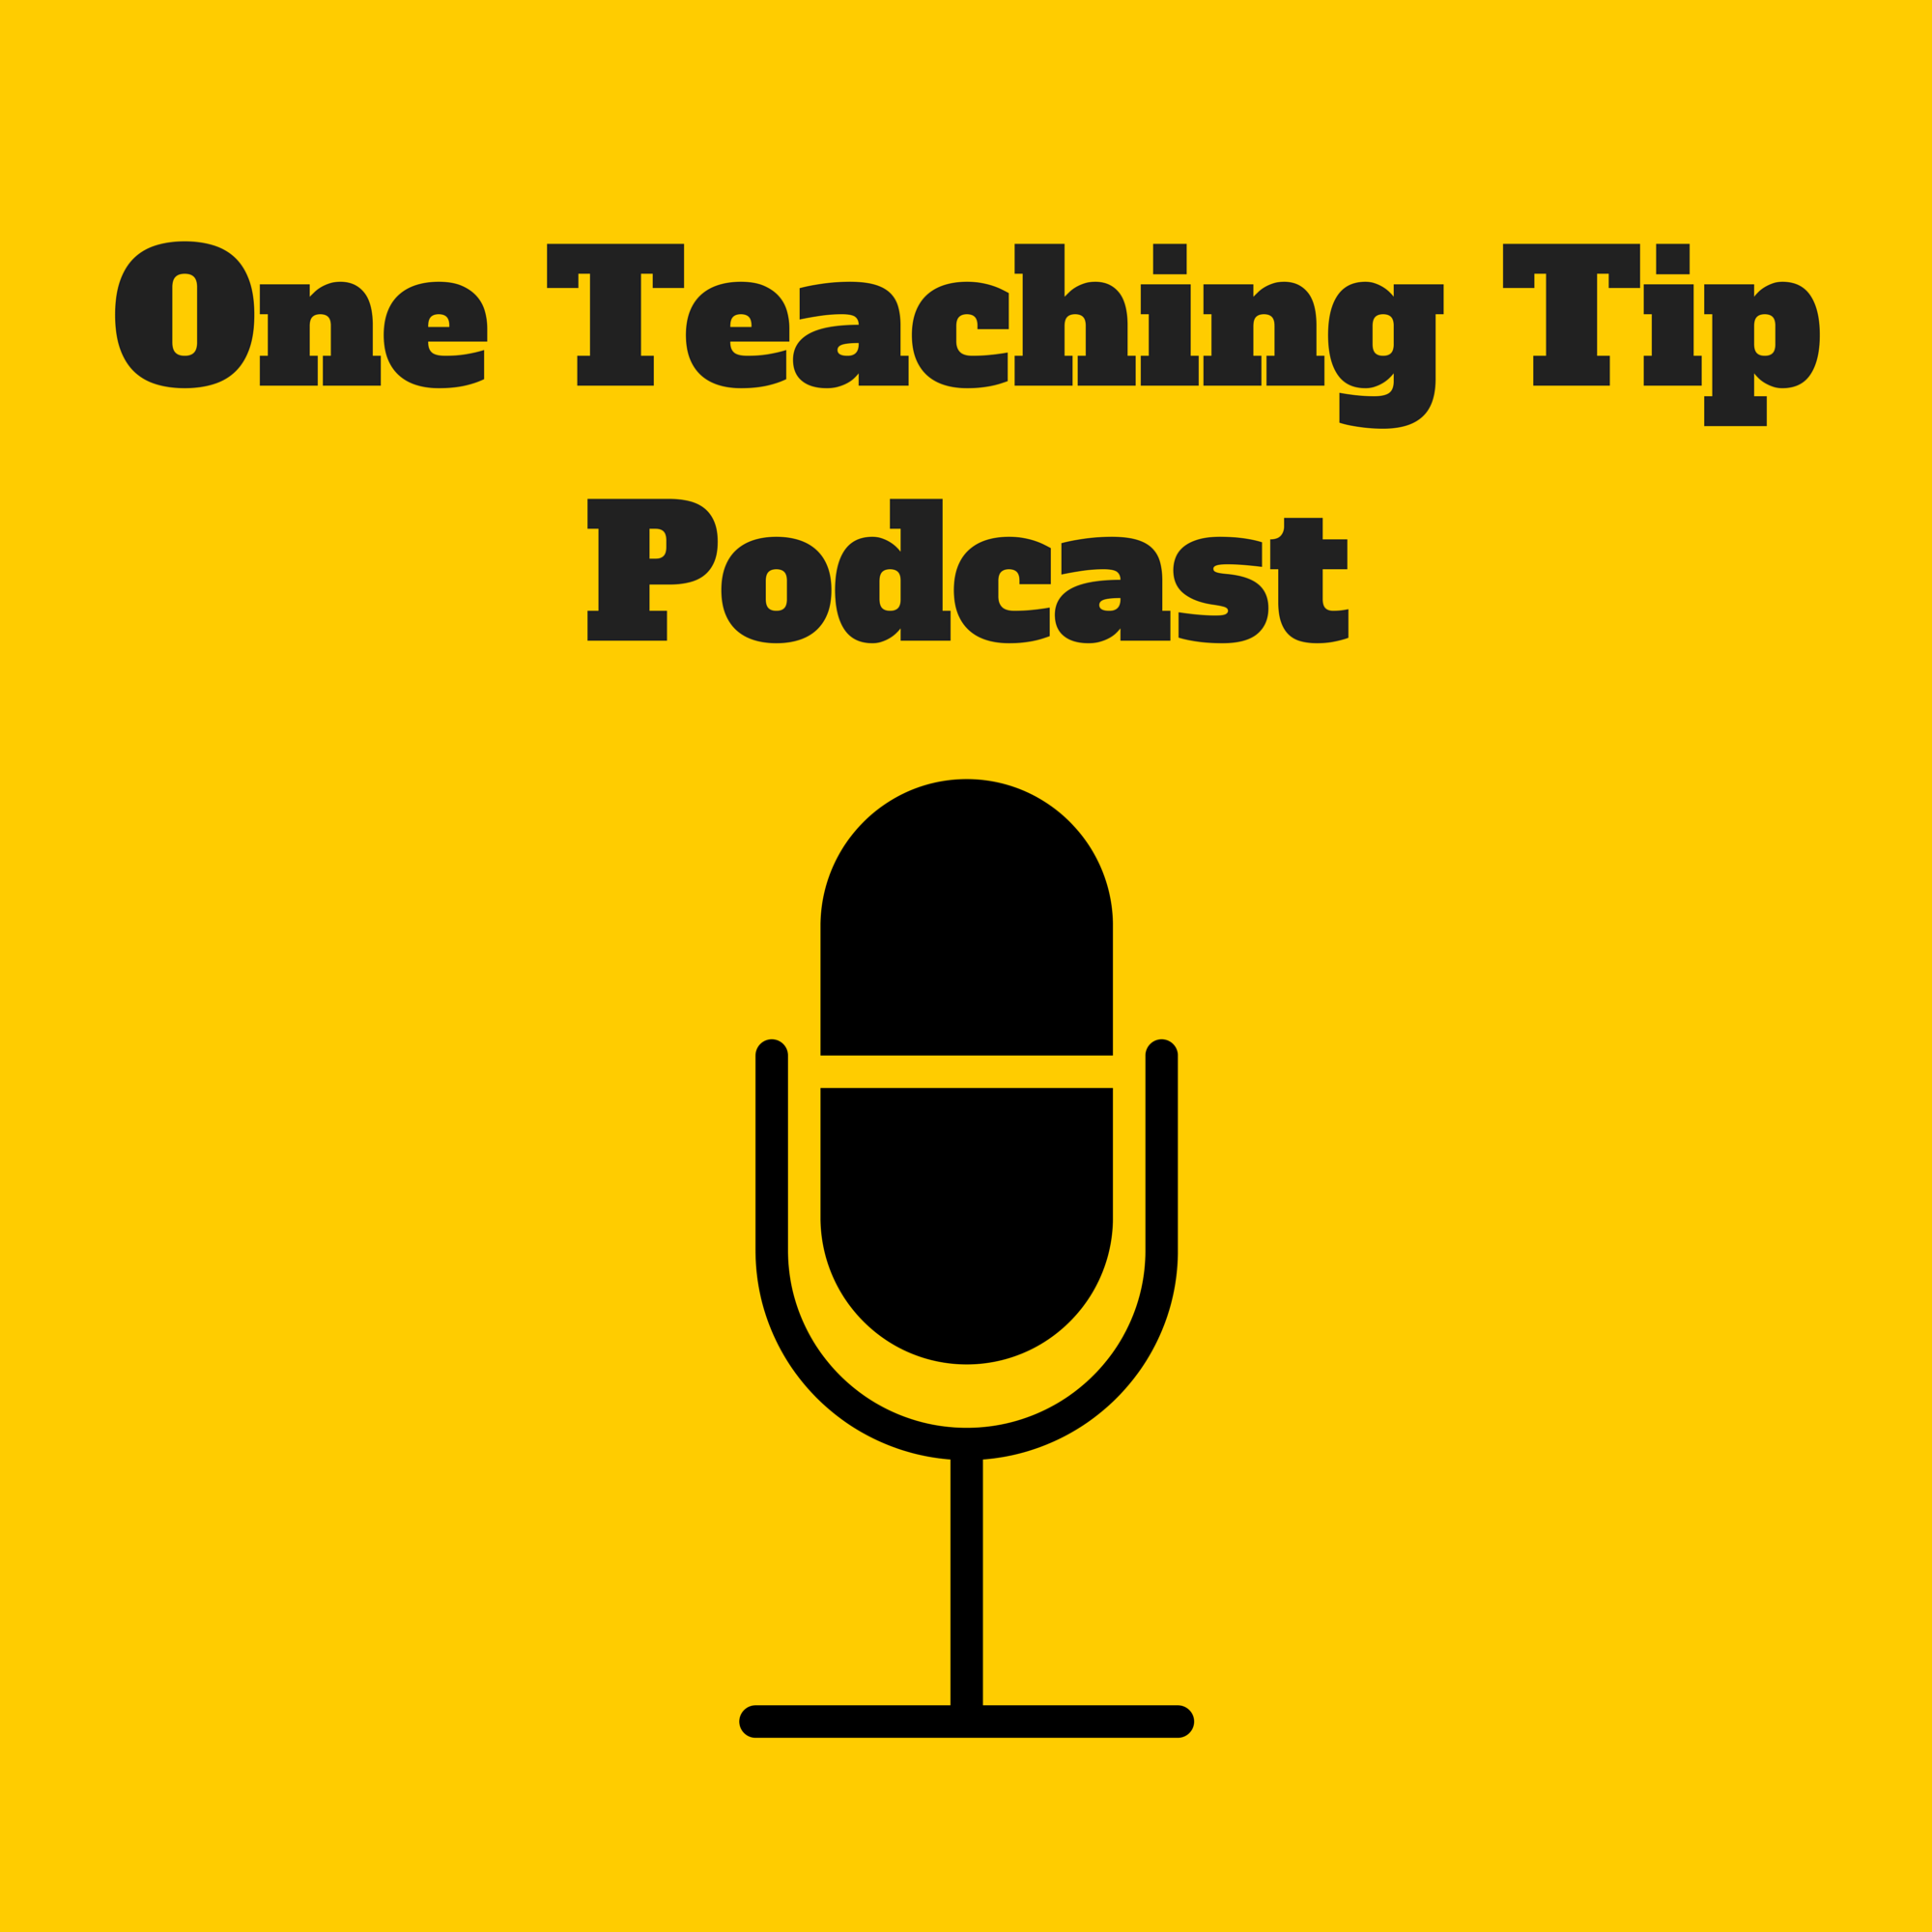 One Teaching Tip show art